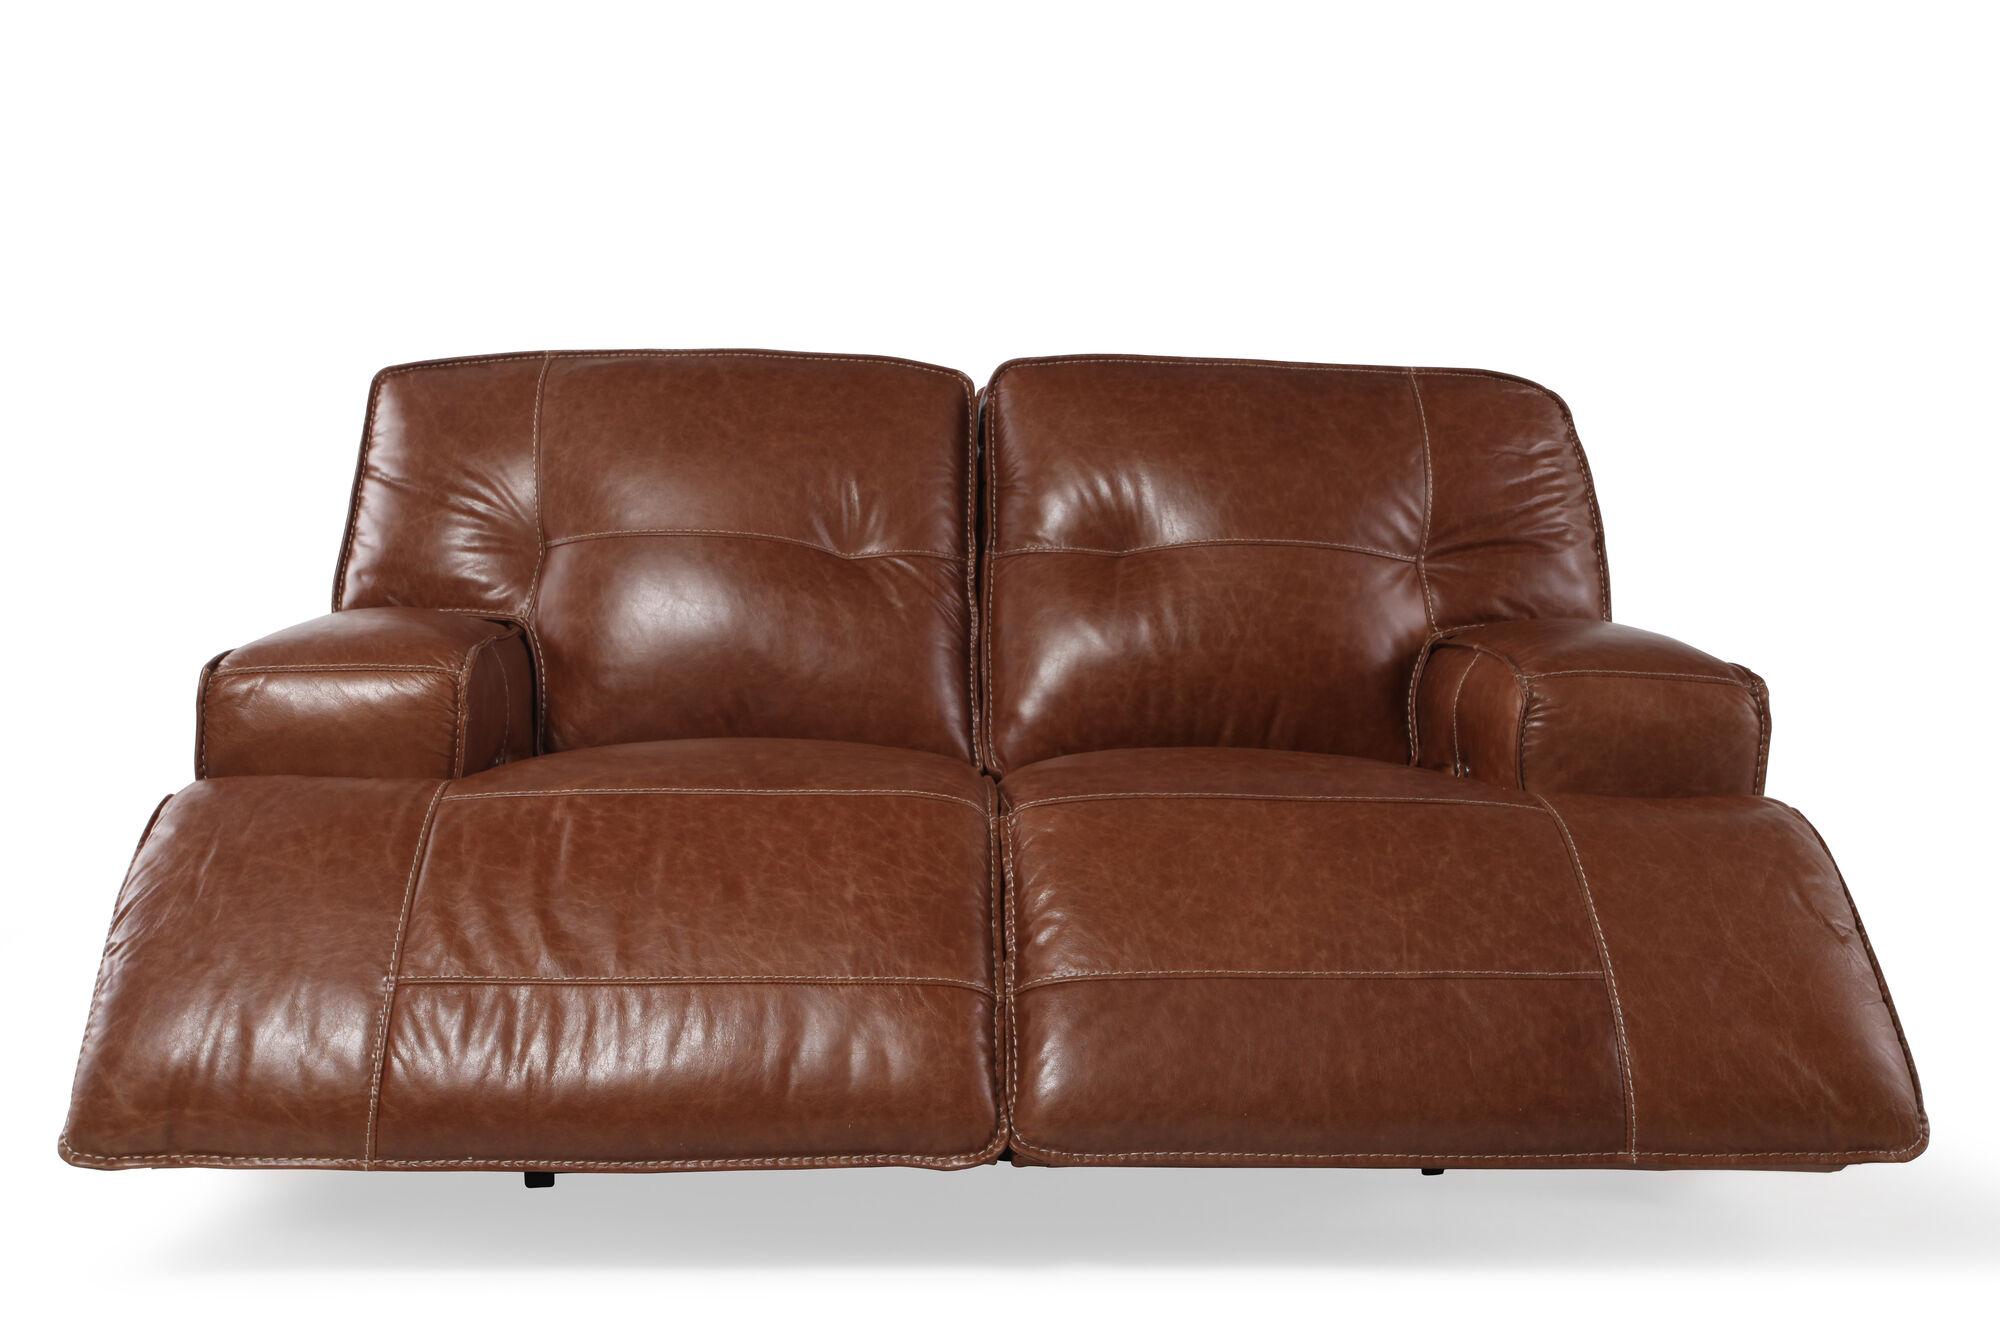 Mathis Brothers Furniture stores in Oklahoma City (OKC) & Tulsa, OK; Ontario & Indio, CA.